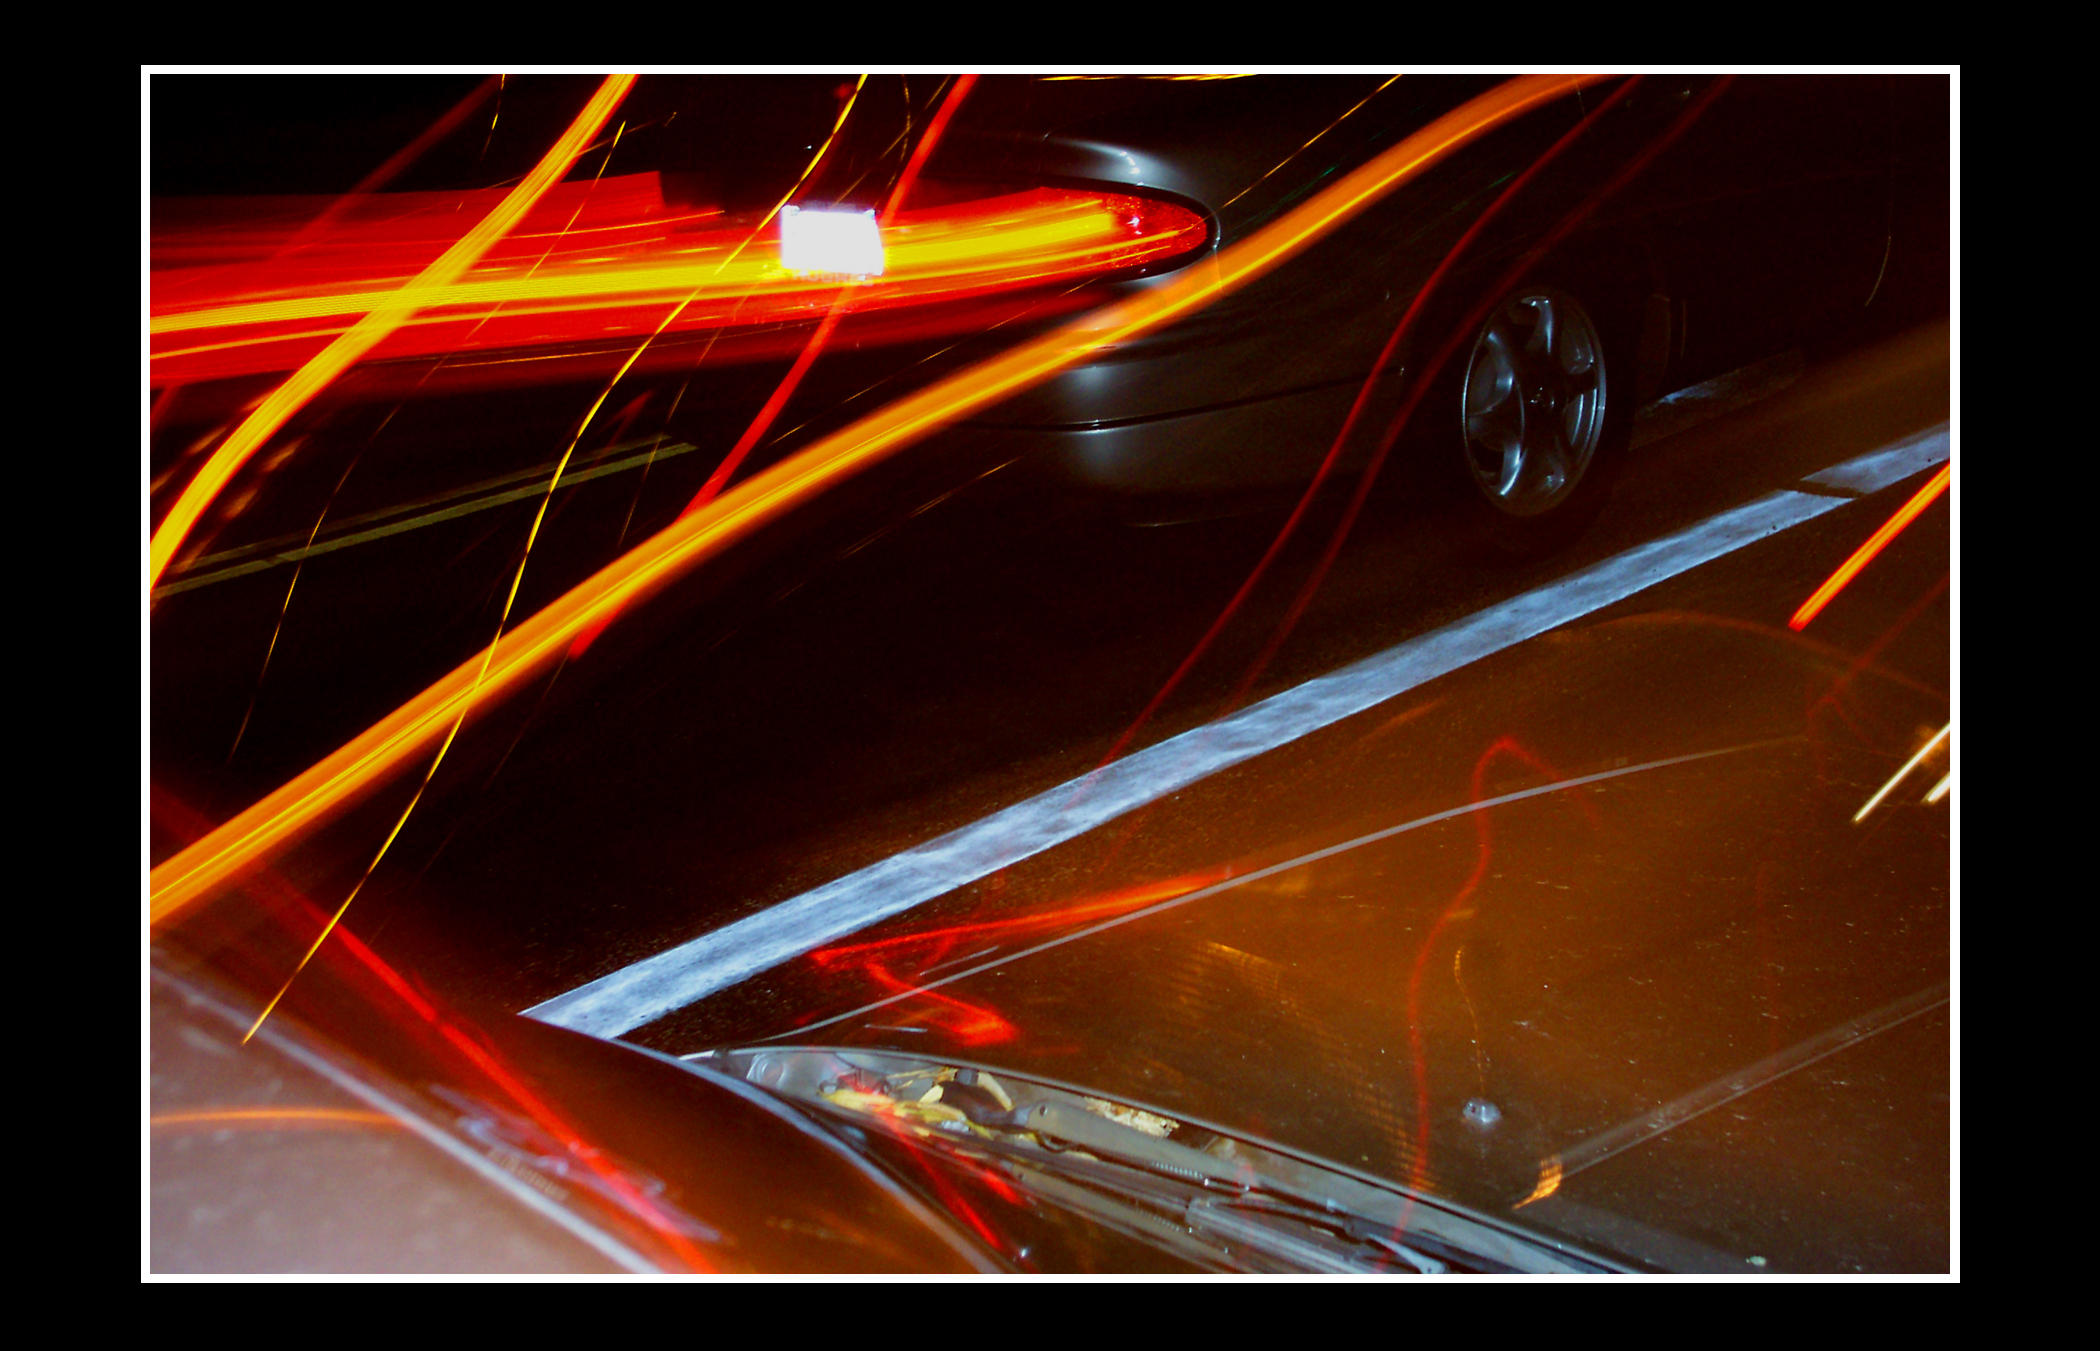 car by pyrojohnhippy